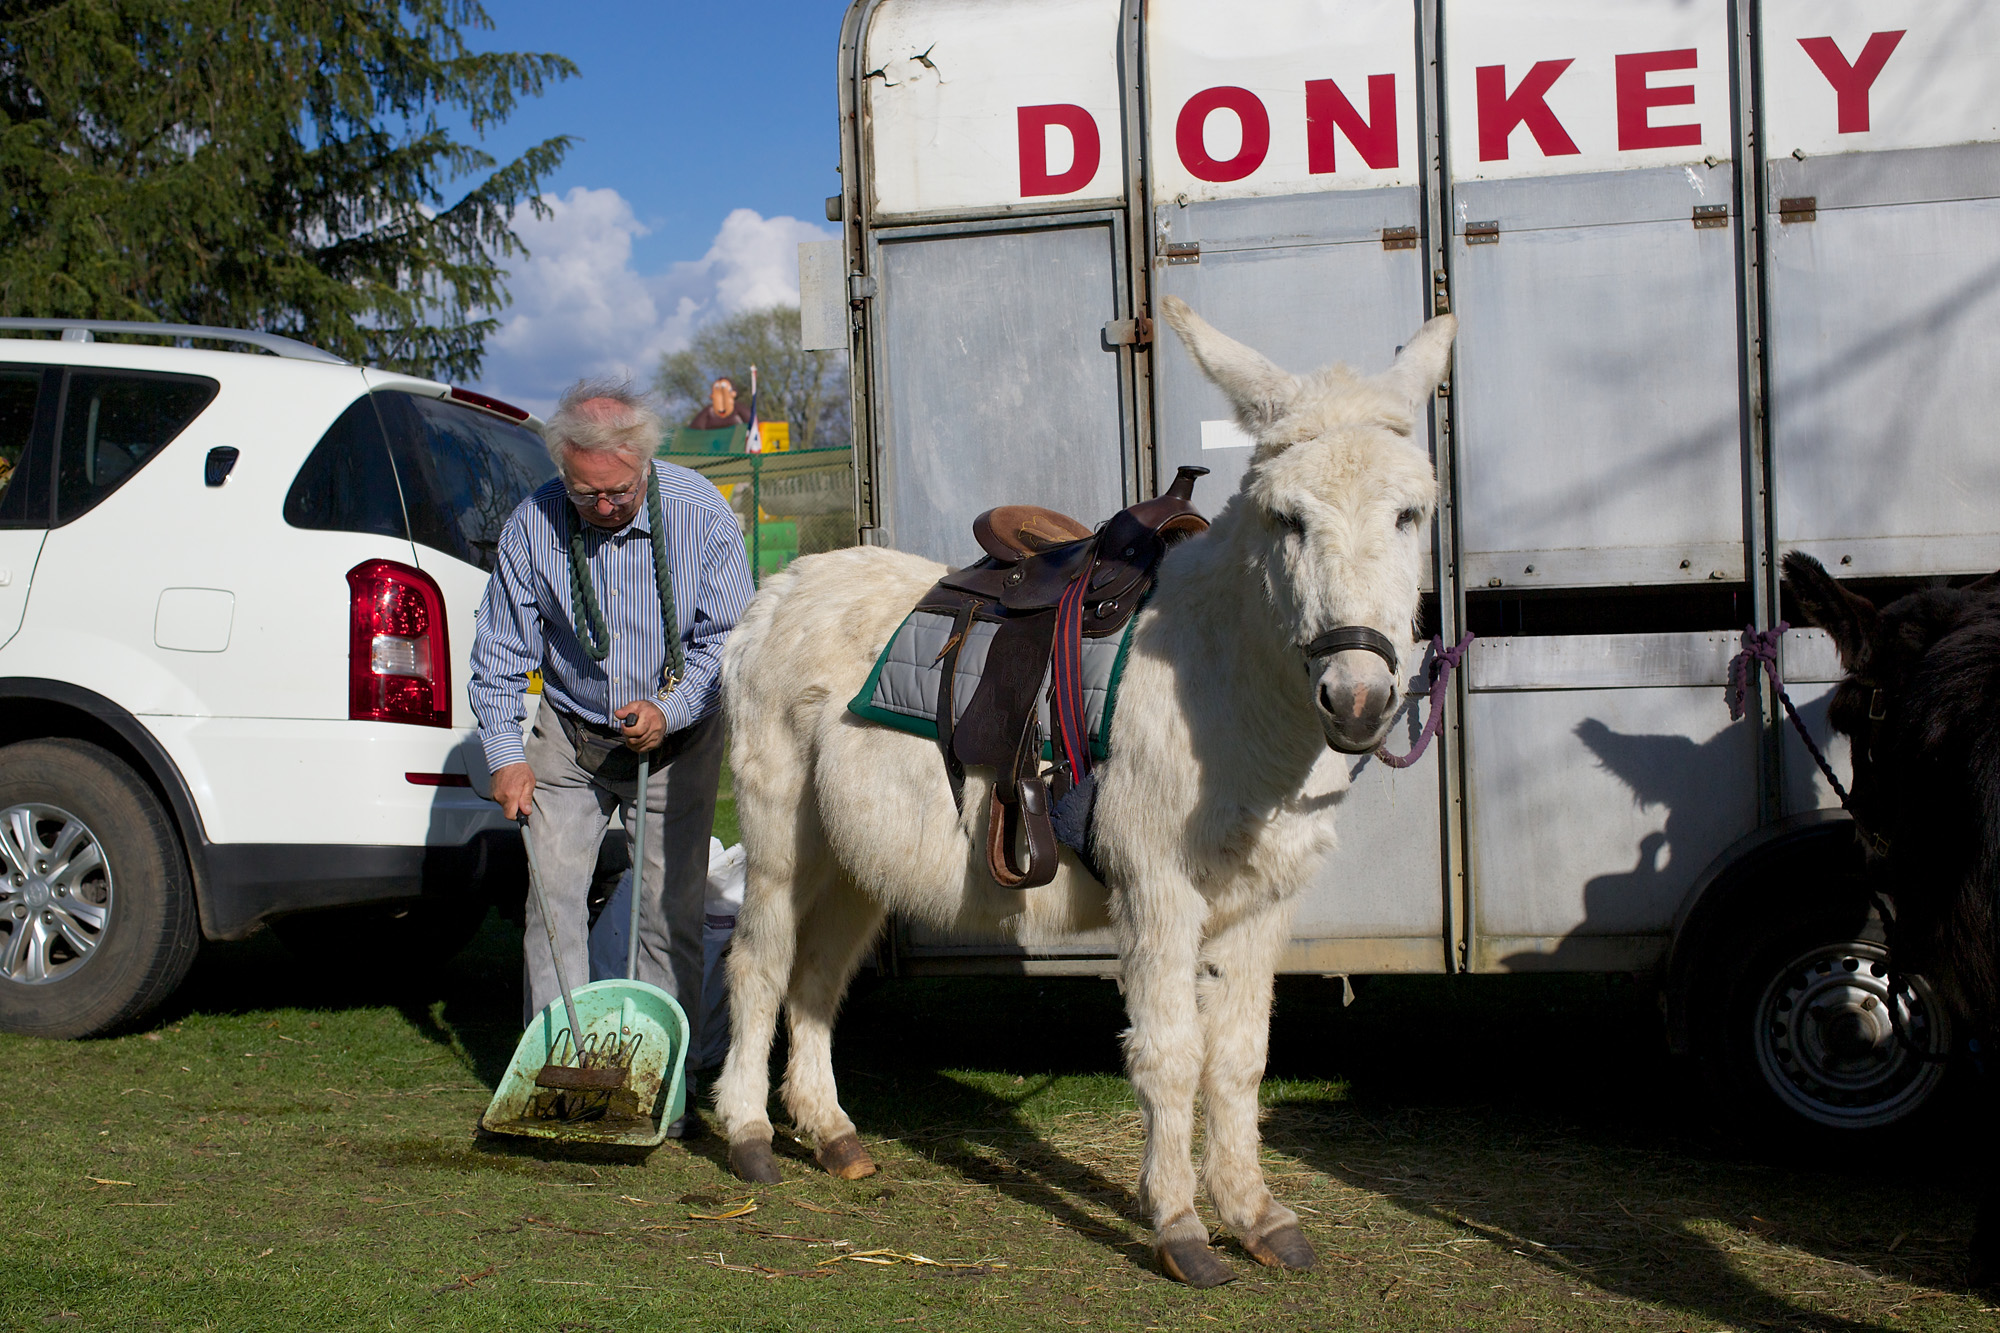 Donkey Poo